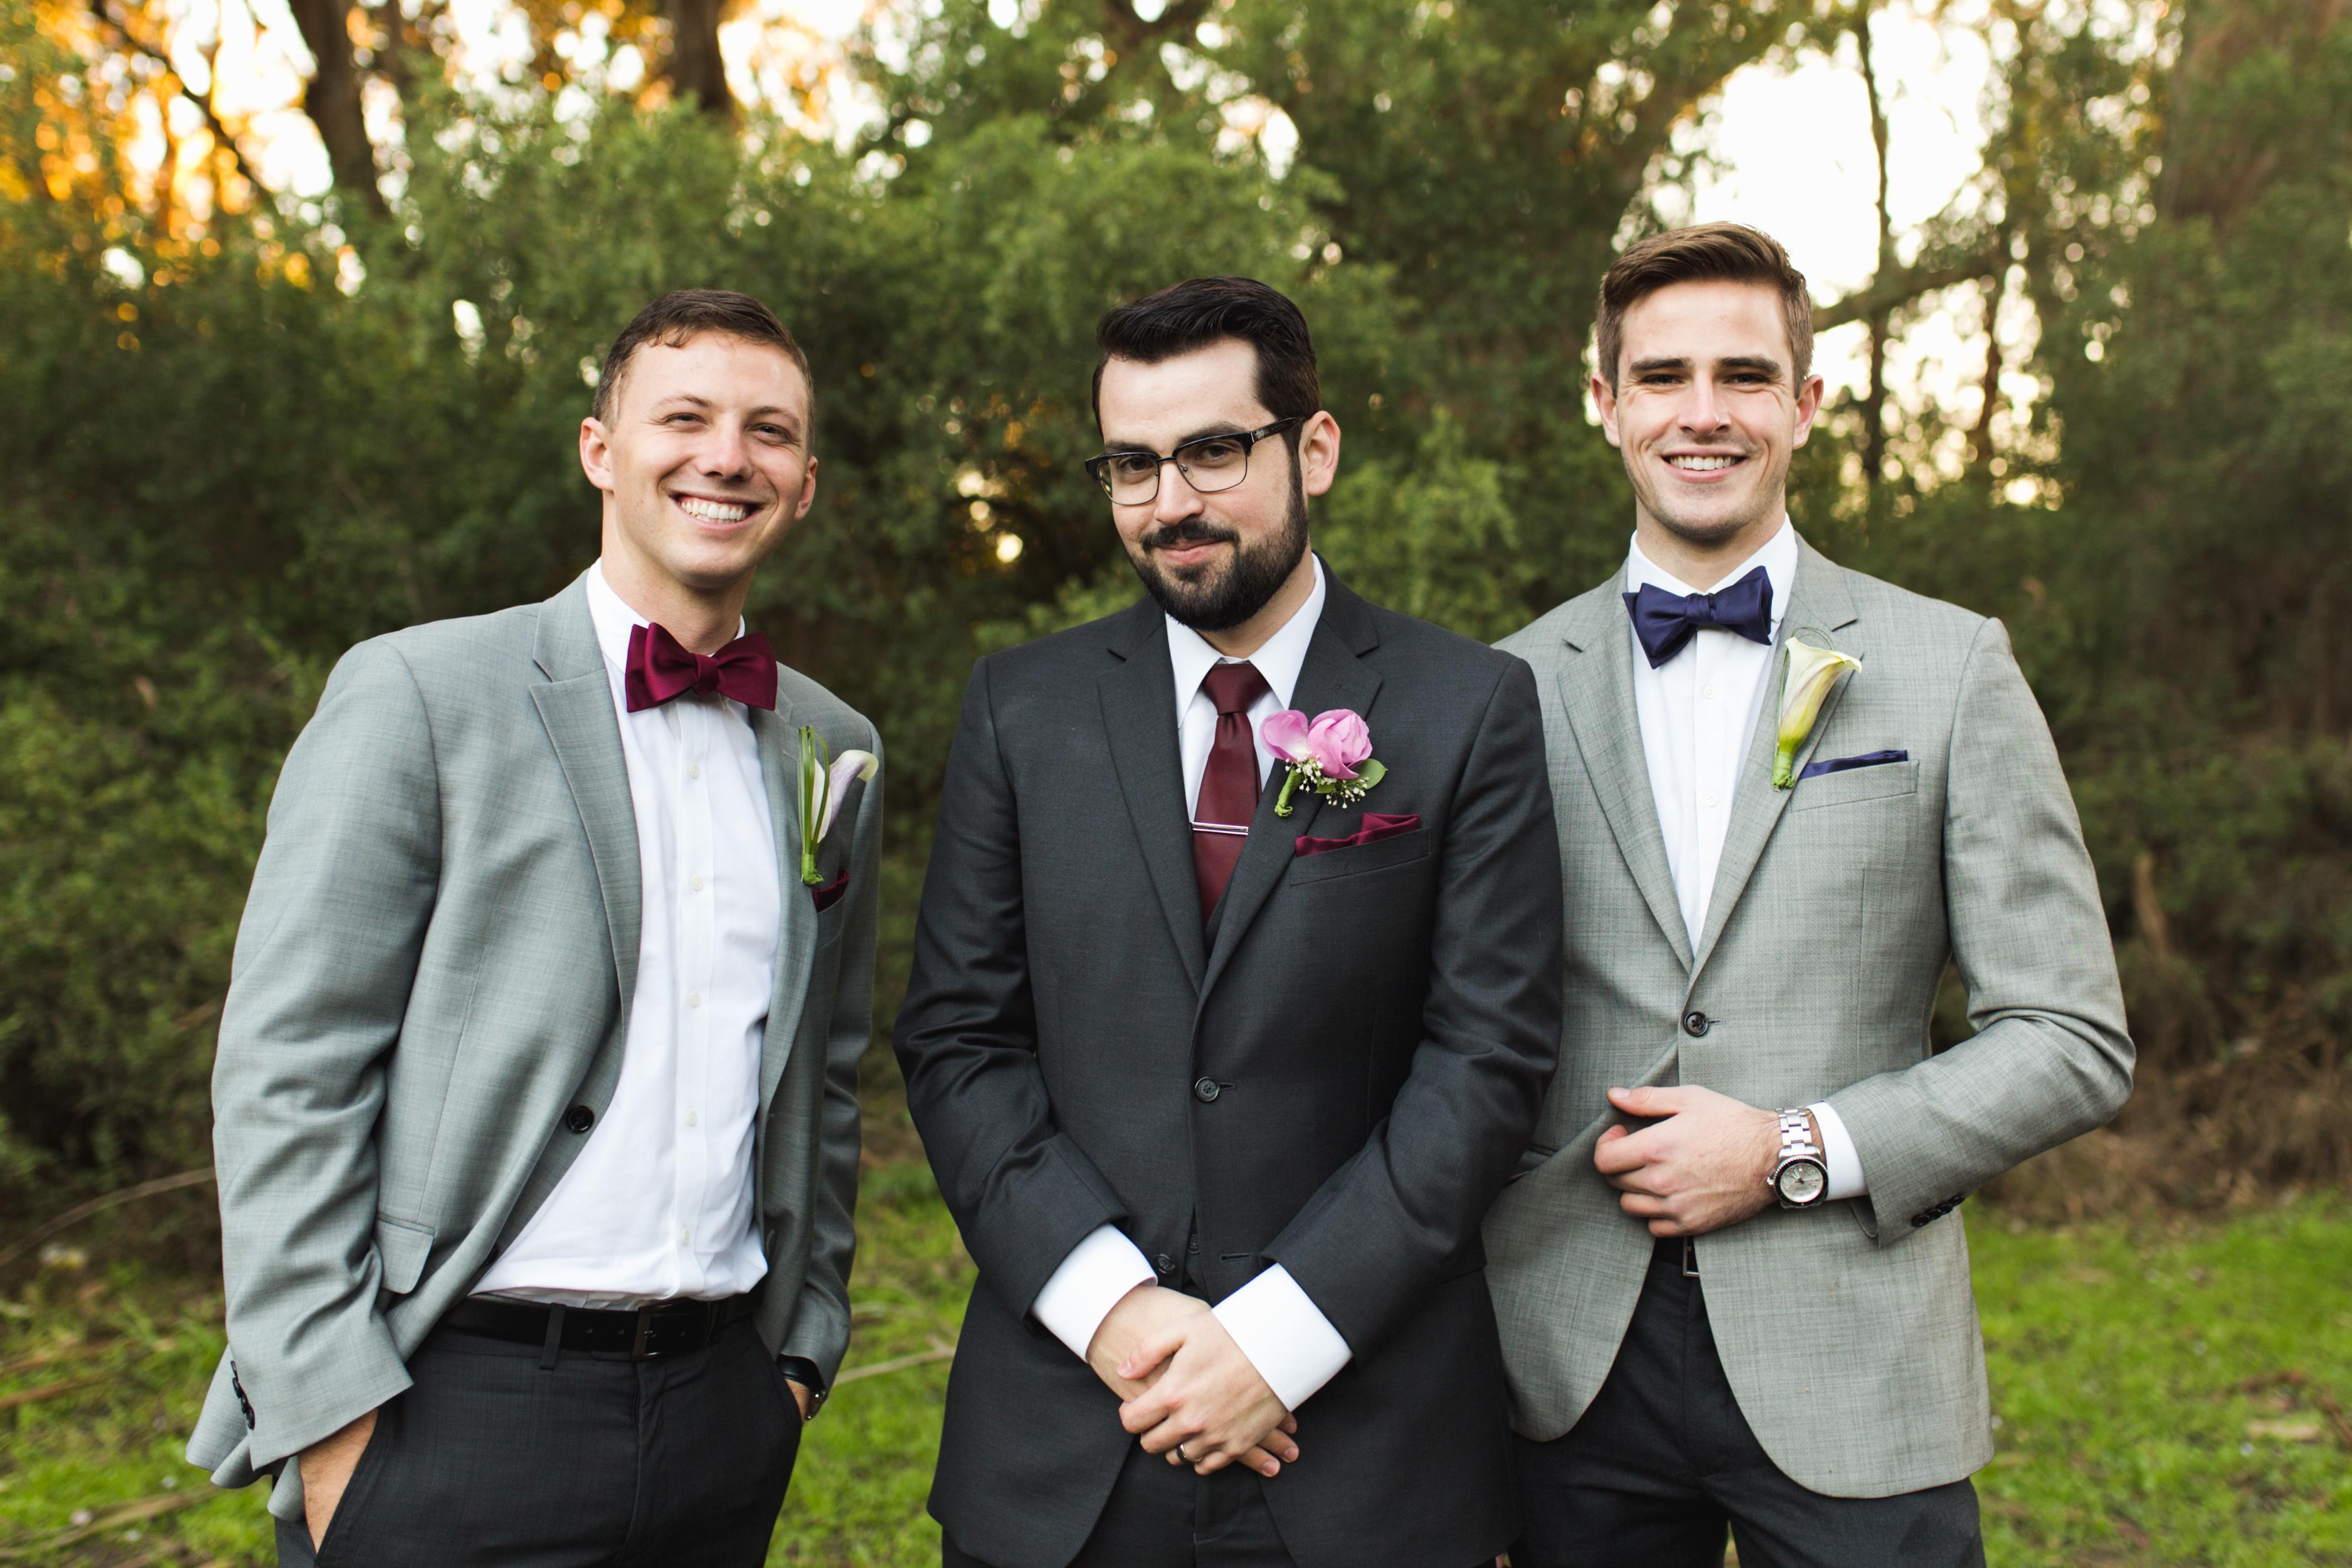 golden-gate-park-san-francisco-wedding-groomsmen-photo